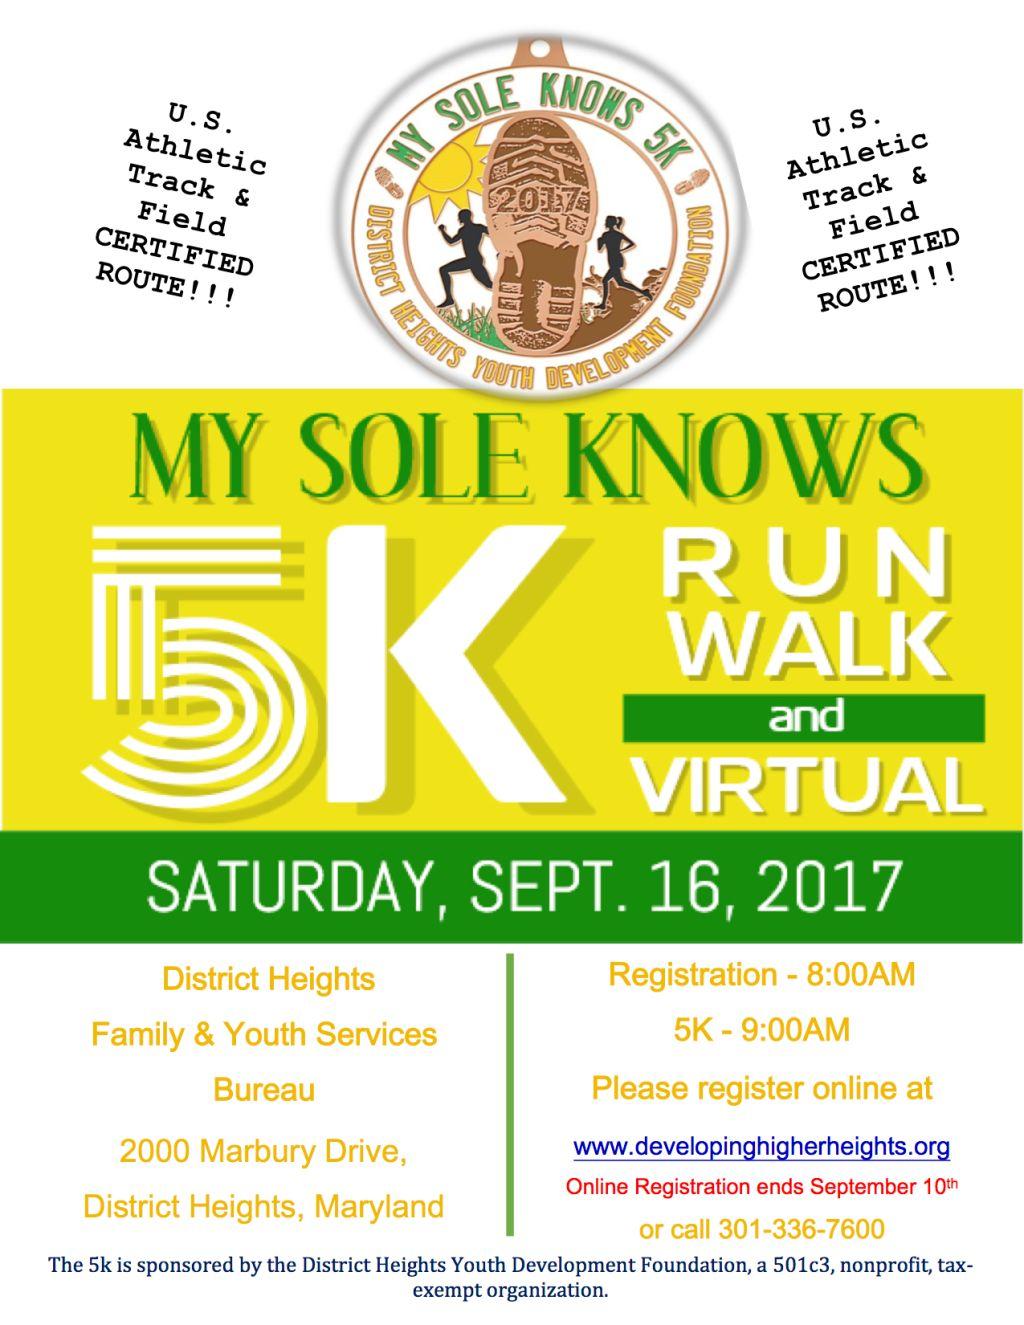 The My Sole Knows 5K Walk/Run